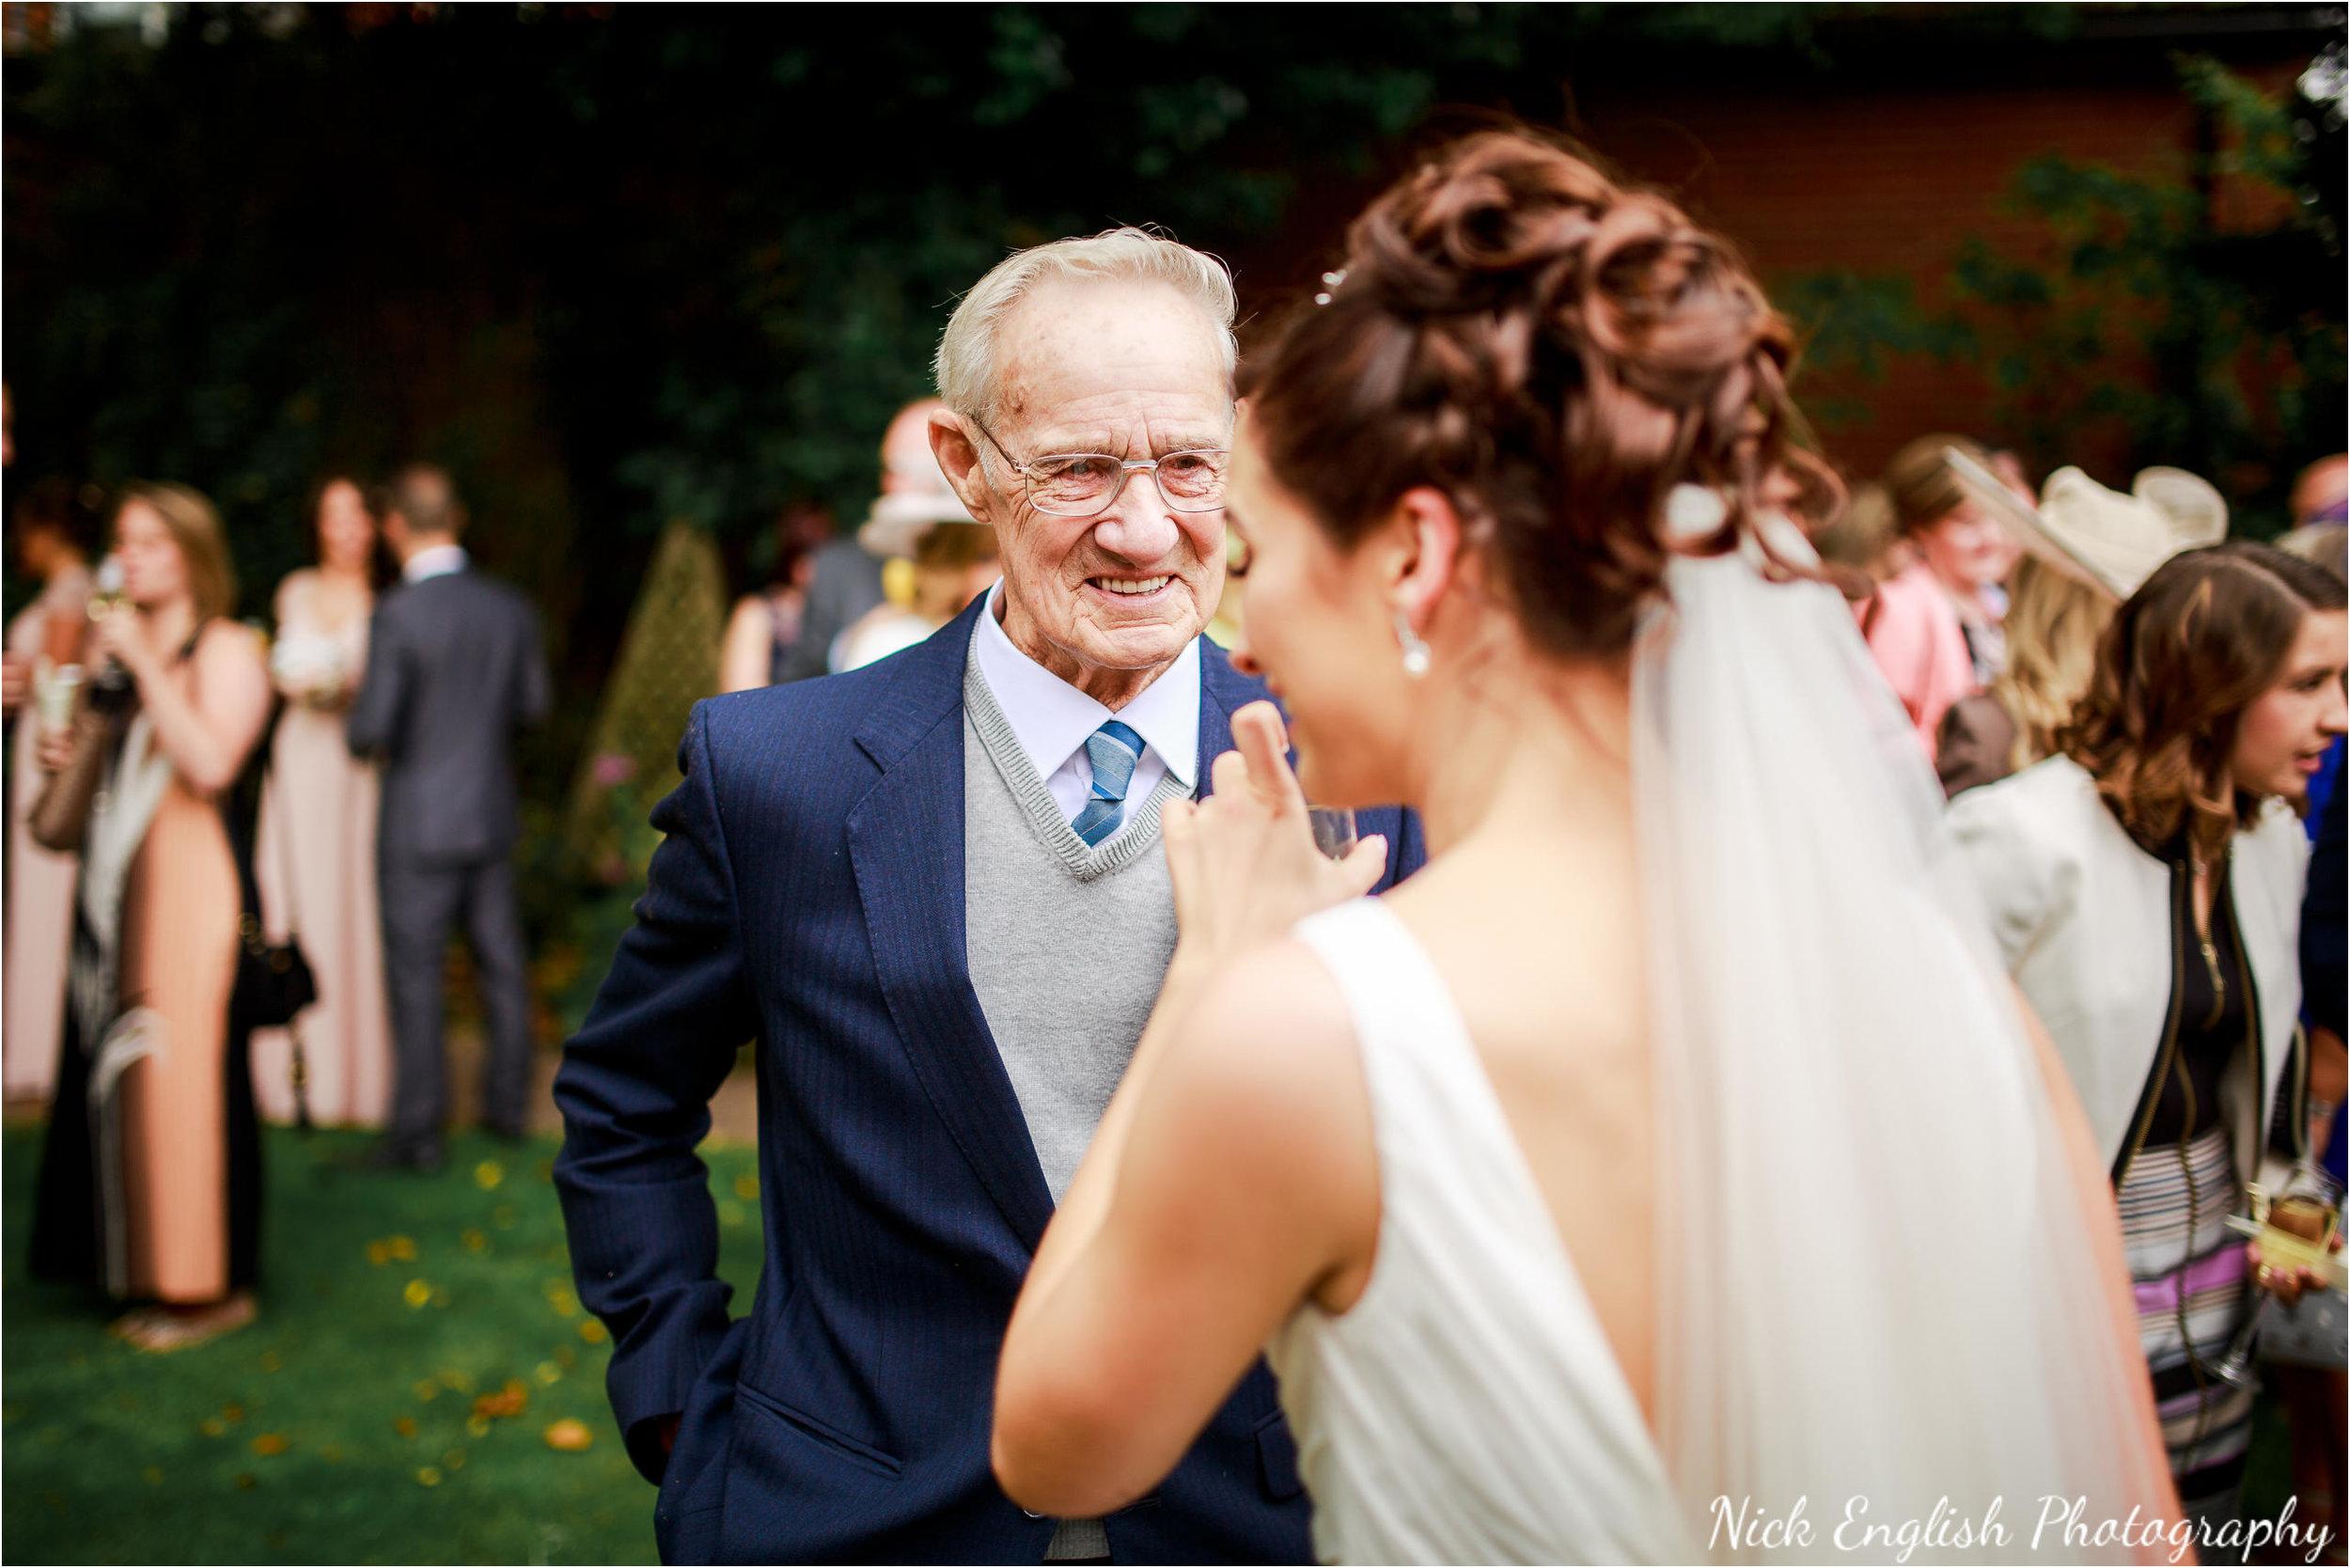 Emily David Wedding Photographs at Barton Grange Preston by Nick English Photography 96jpg.jpeg